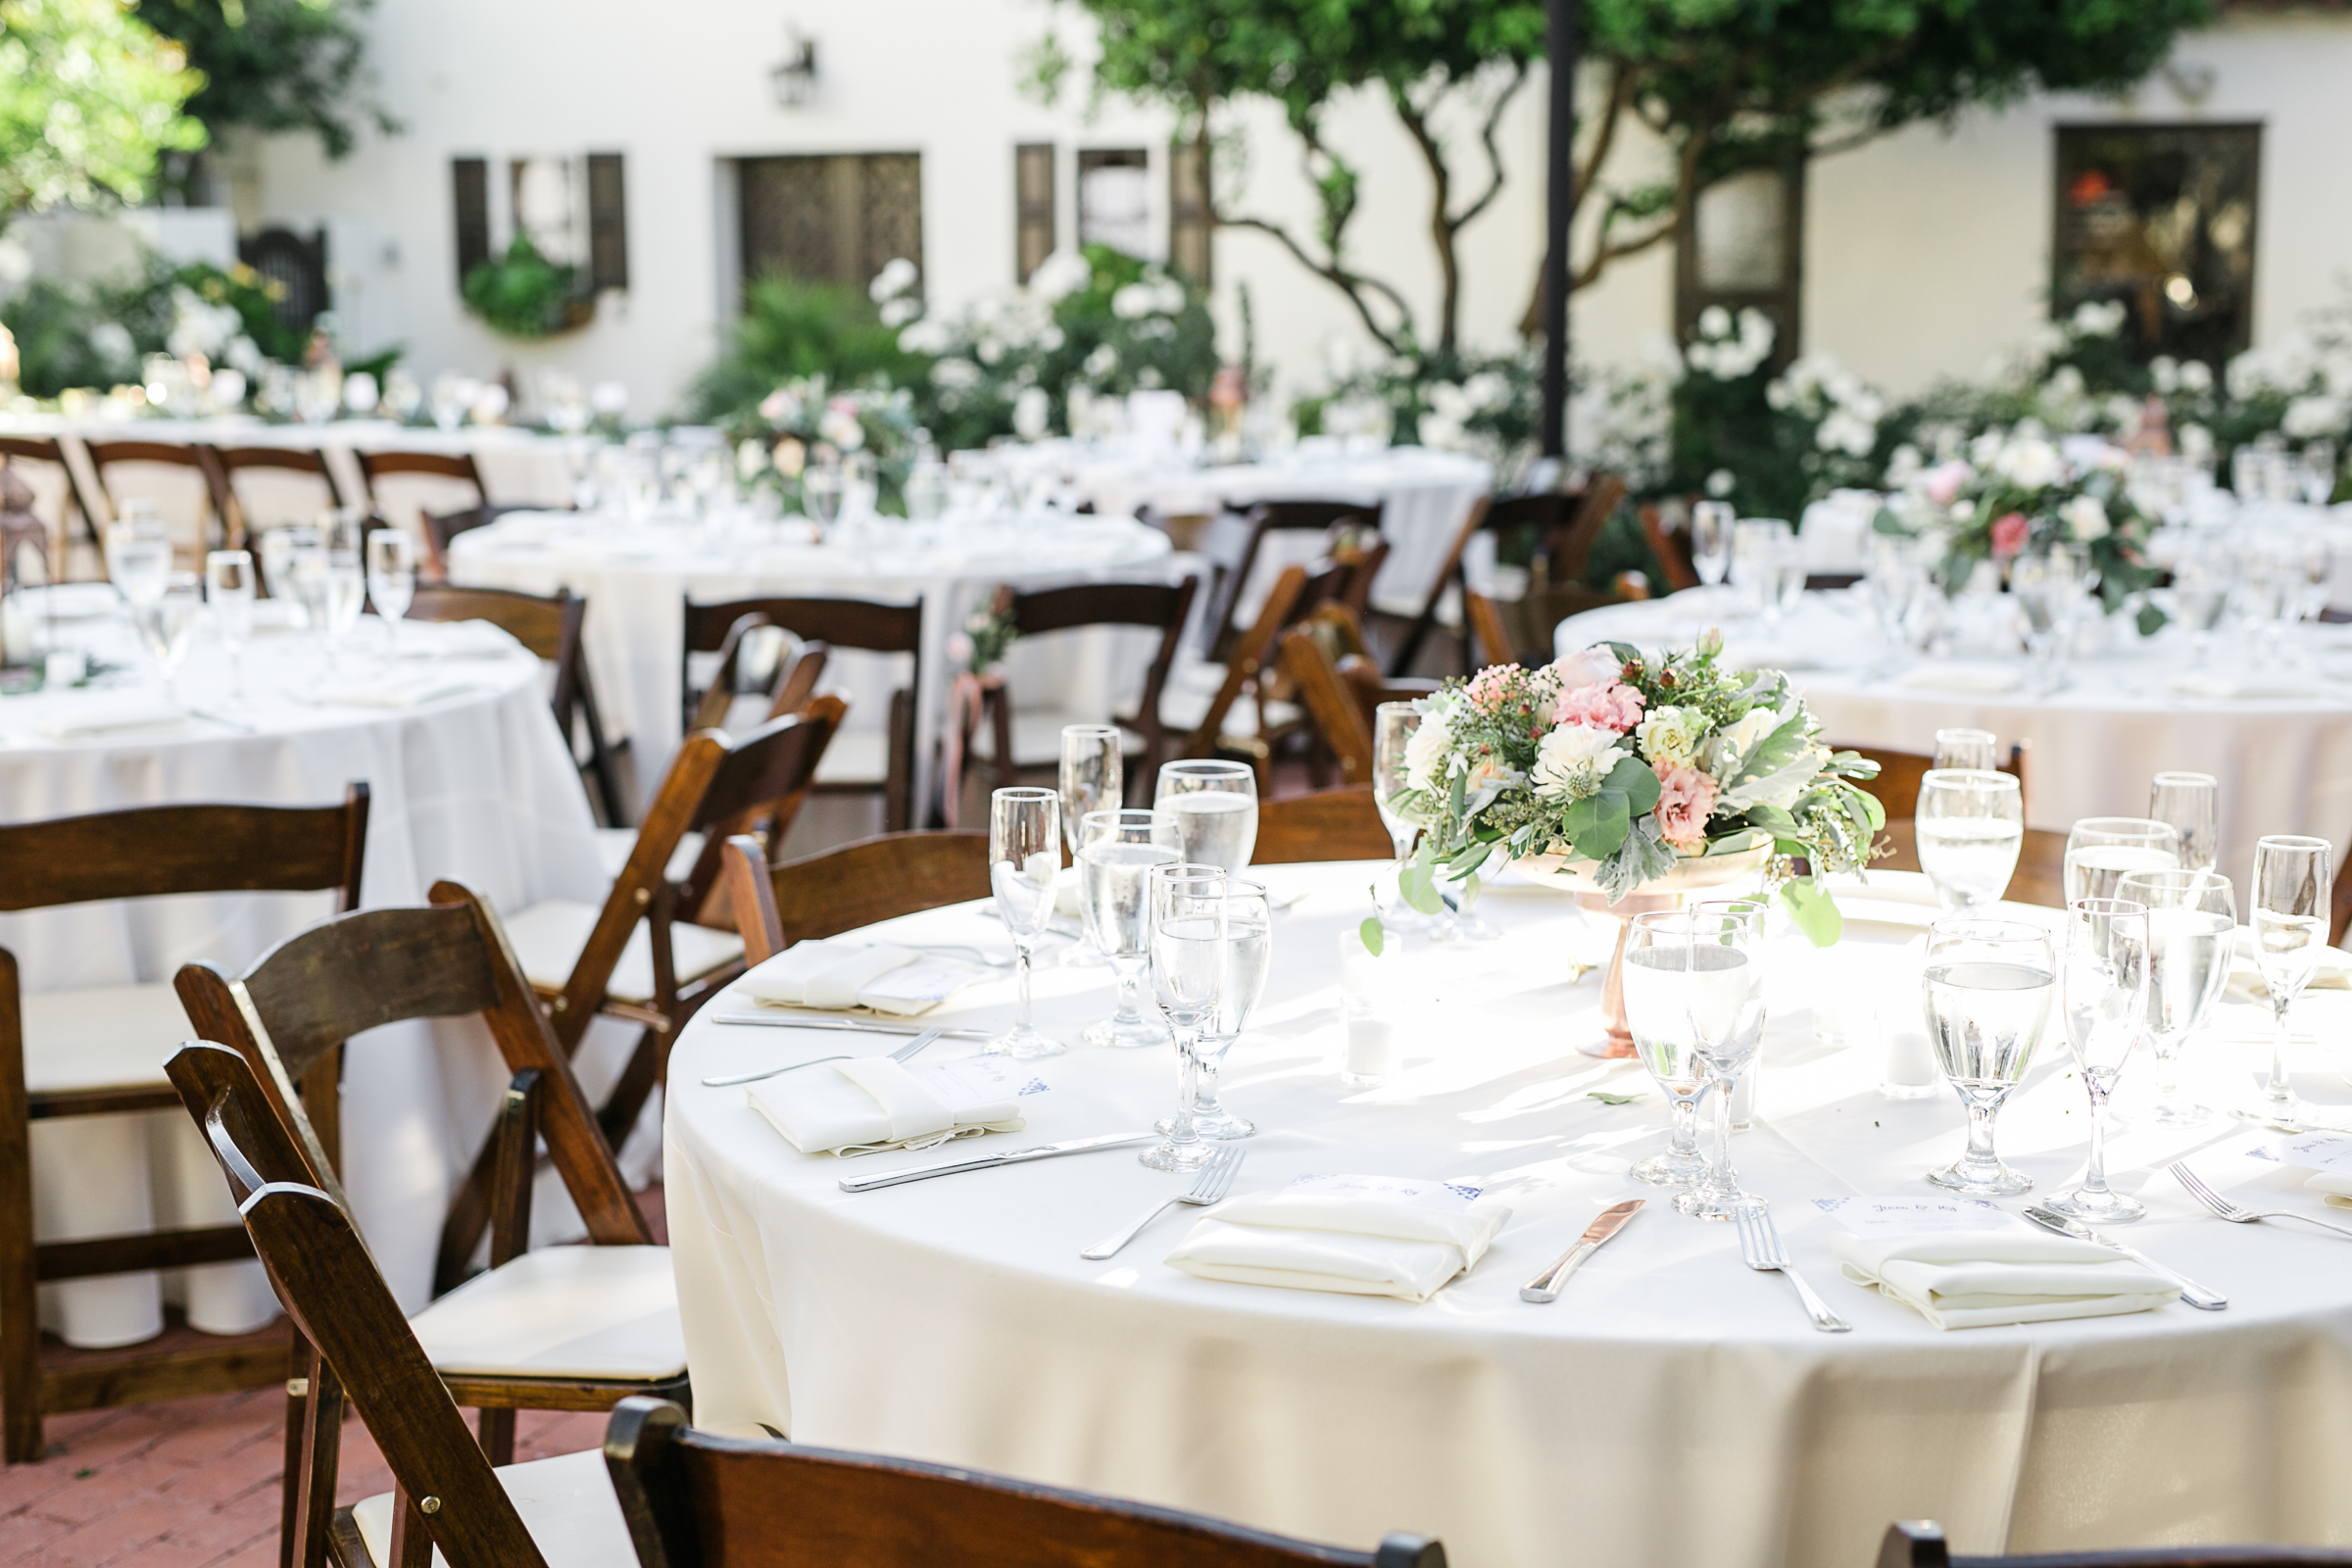 Jenna_&_Kaj_Darlington_House_Wedding_4_29_17-452.jpg